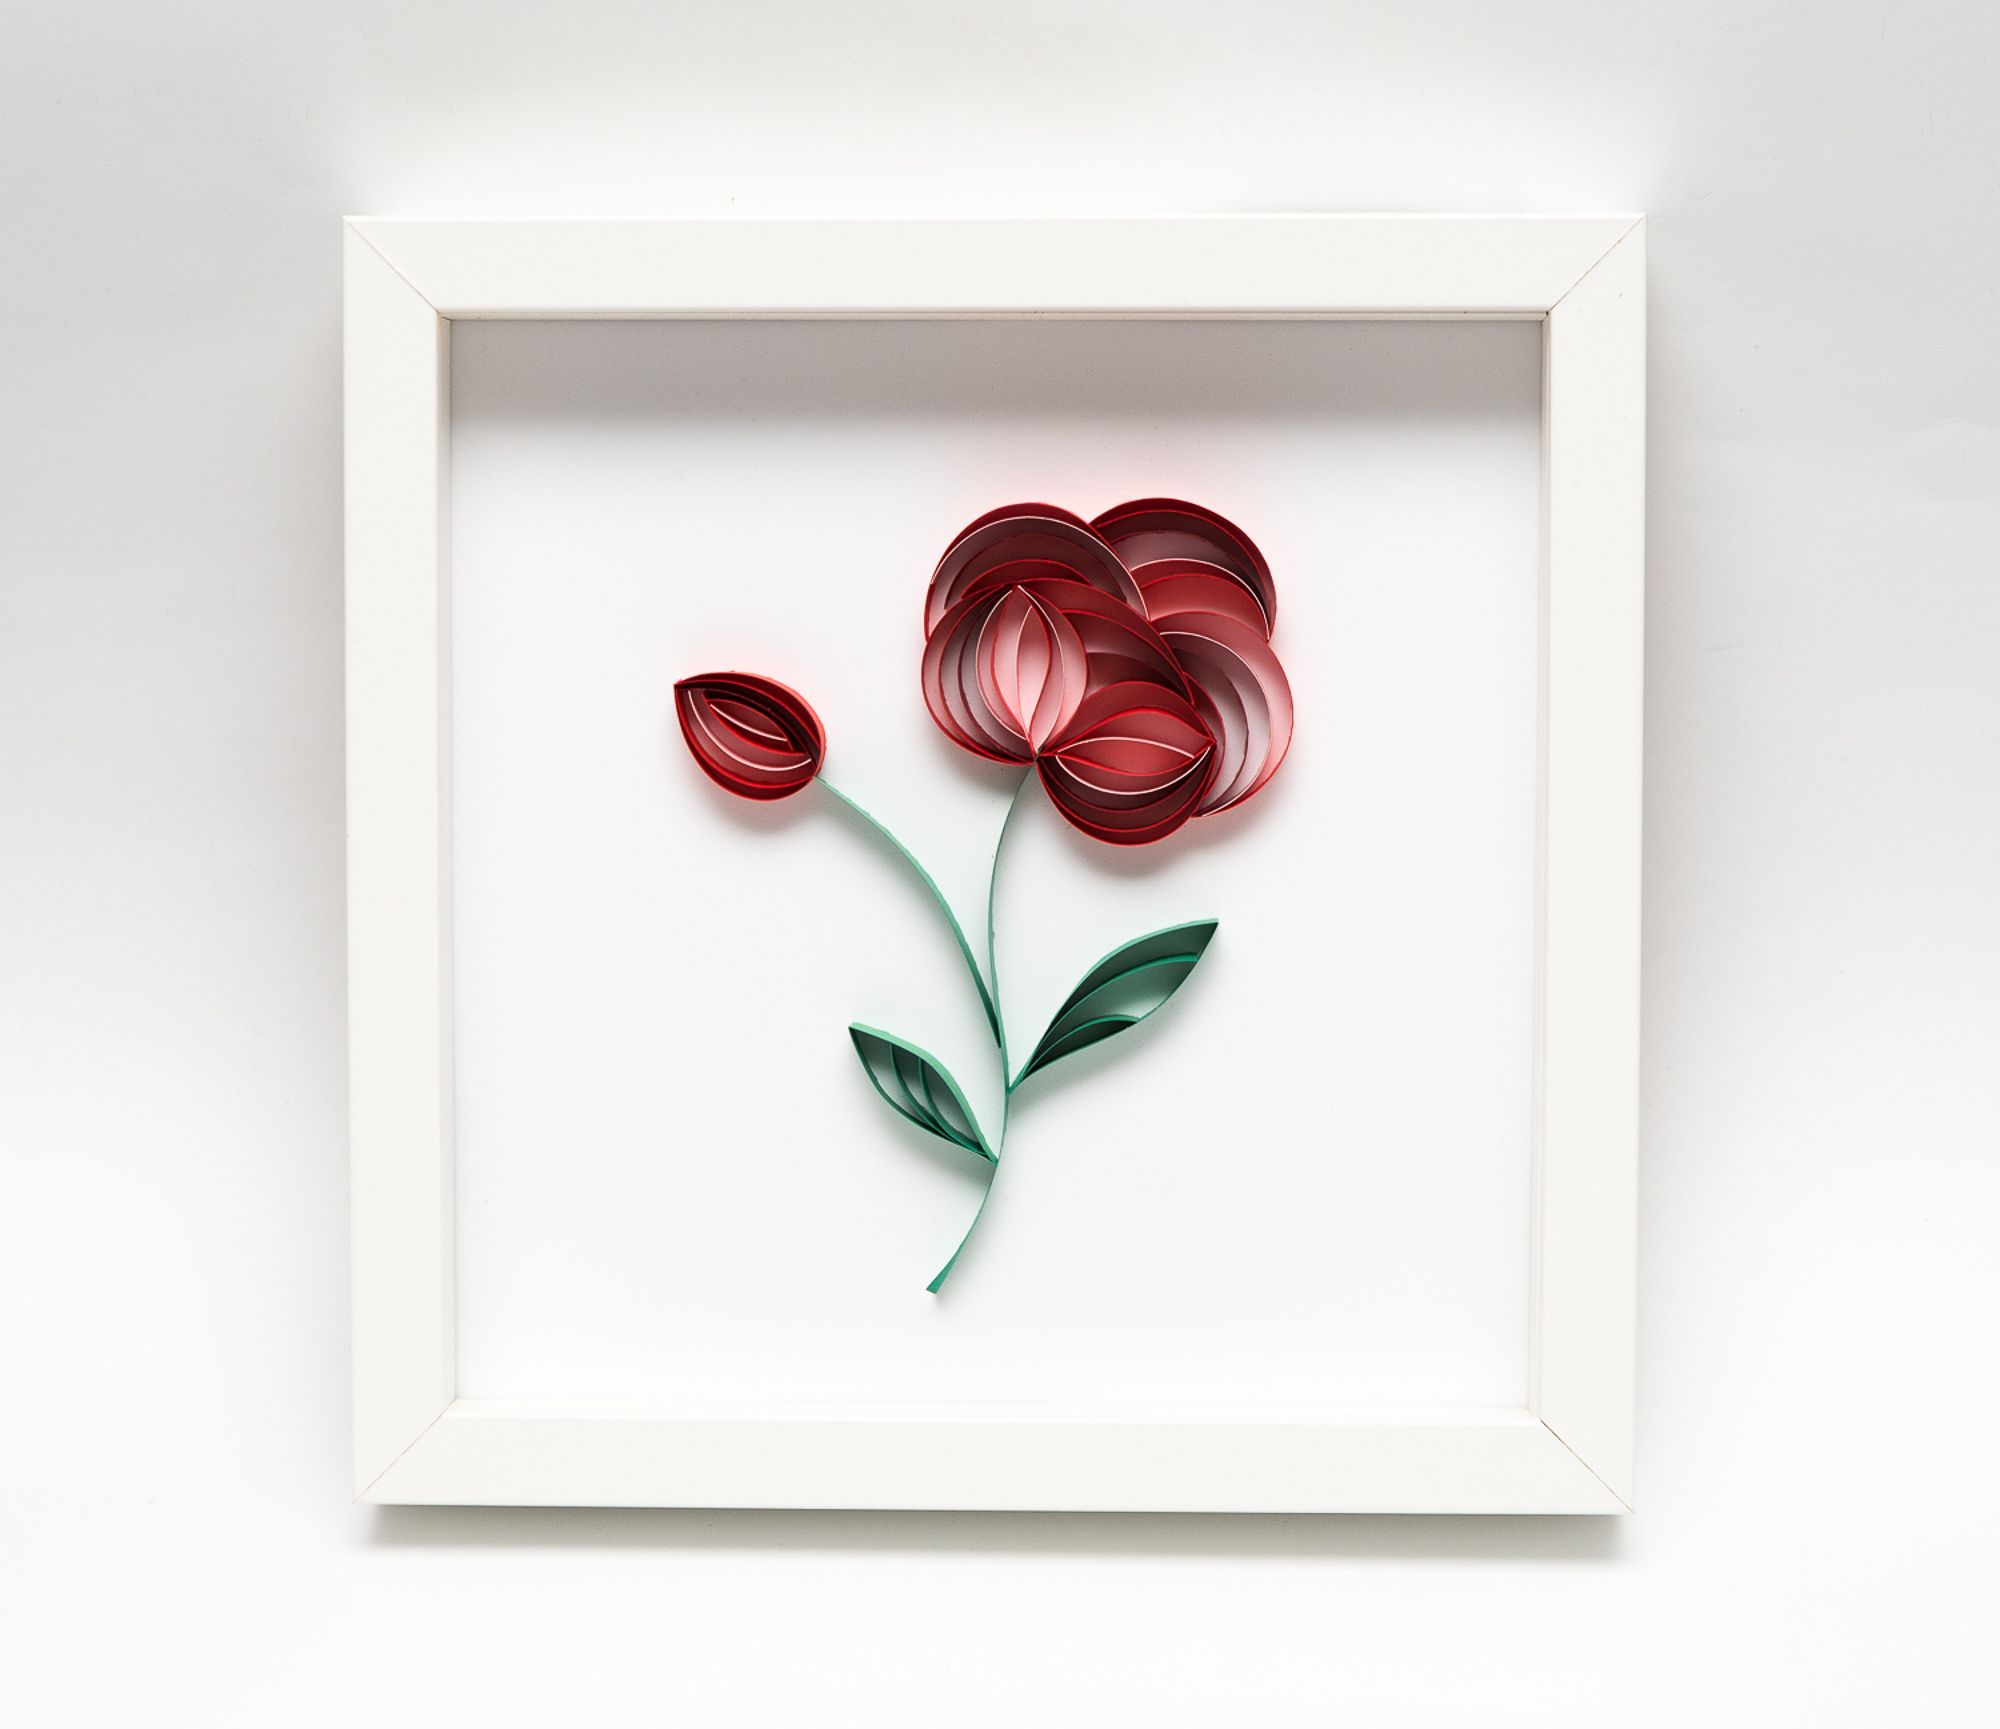 Kwiat Z Papieru Obrazek Z Czerwonym Kwiatem Quilling Dzien Matki Dzien Babci Walentynki Paper Quilling Patterns Art Gift Floral Art